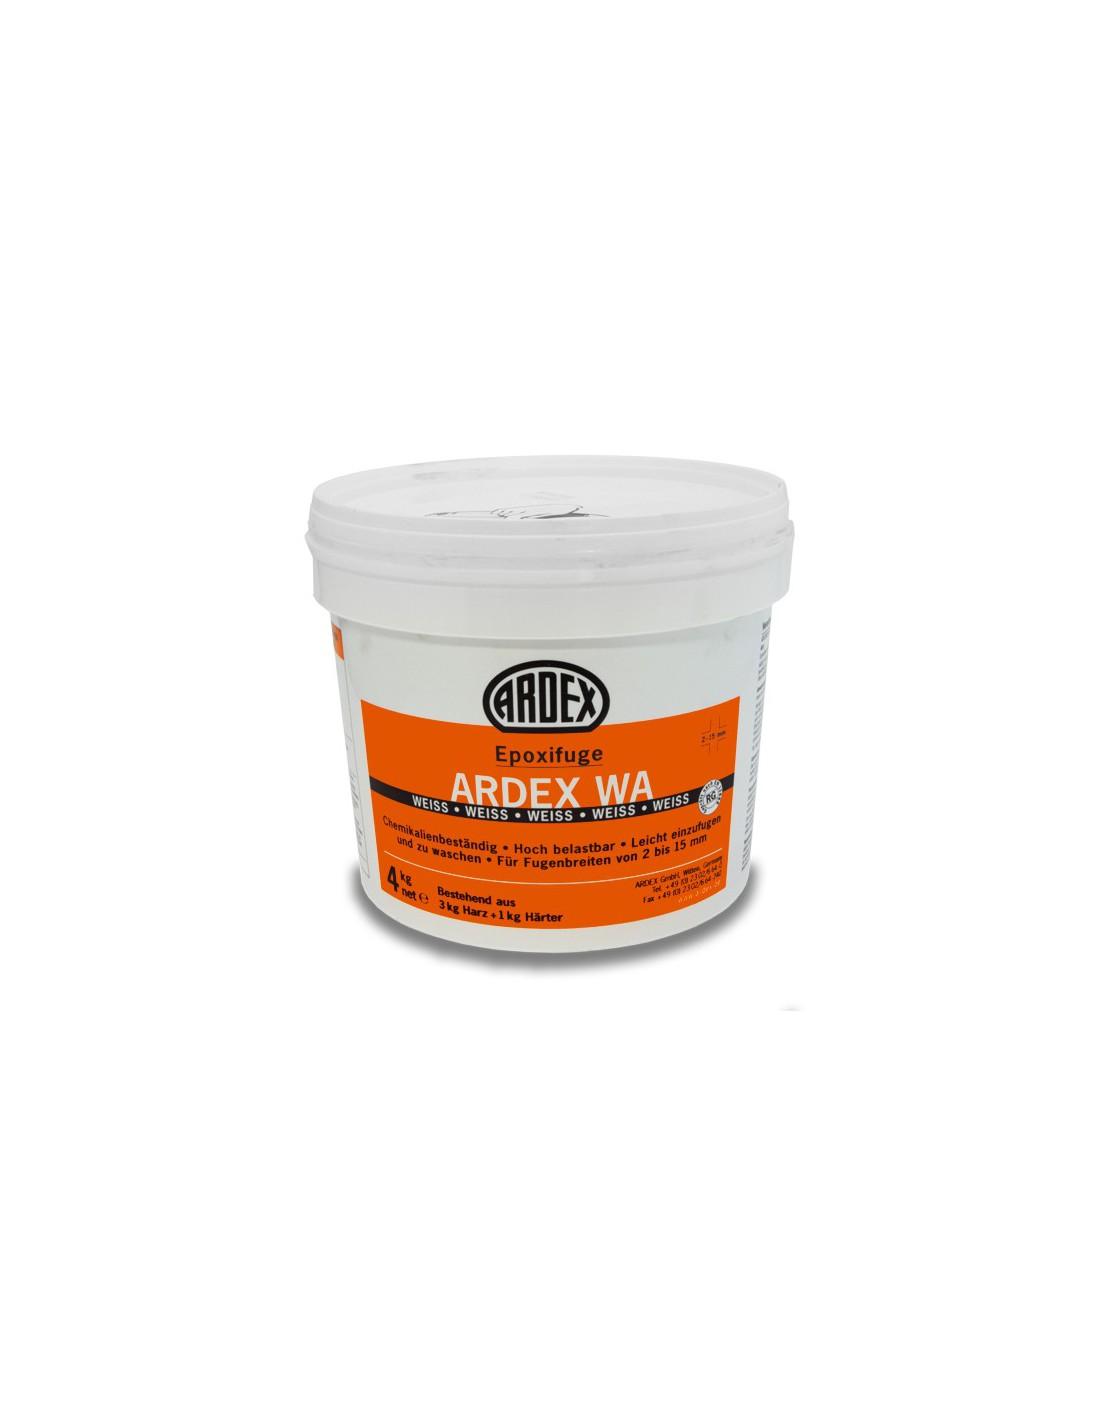 Borada o mortero de resina epoxy para rejuntar azulejos for Mortero para juntas exterior